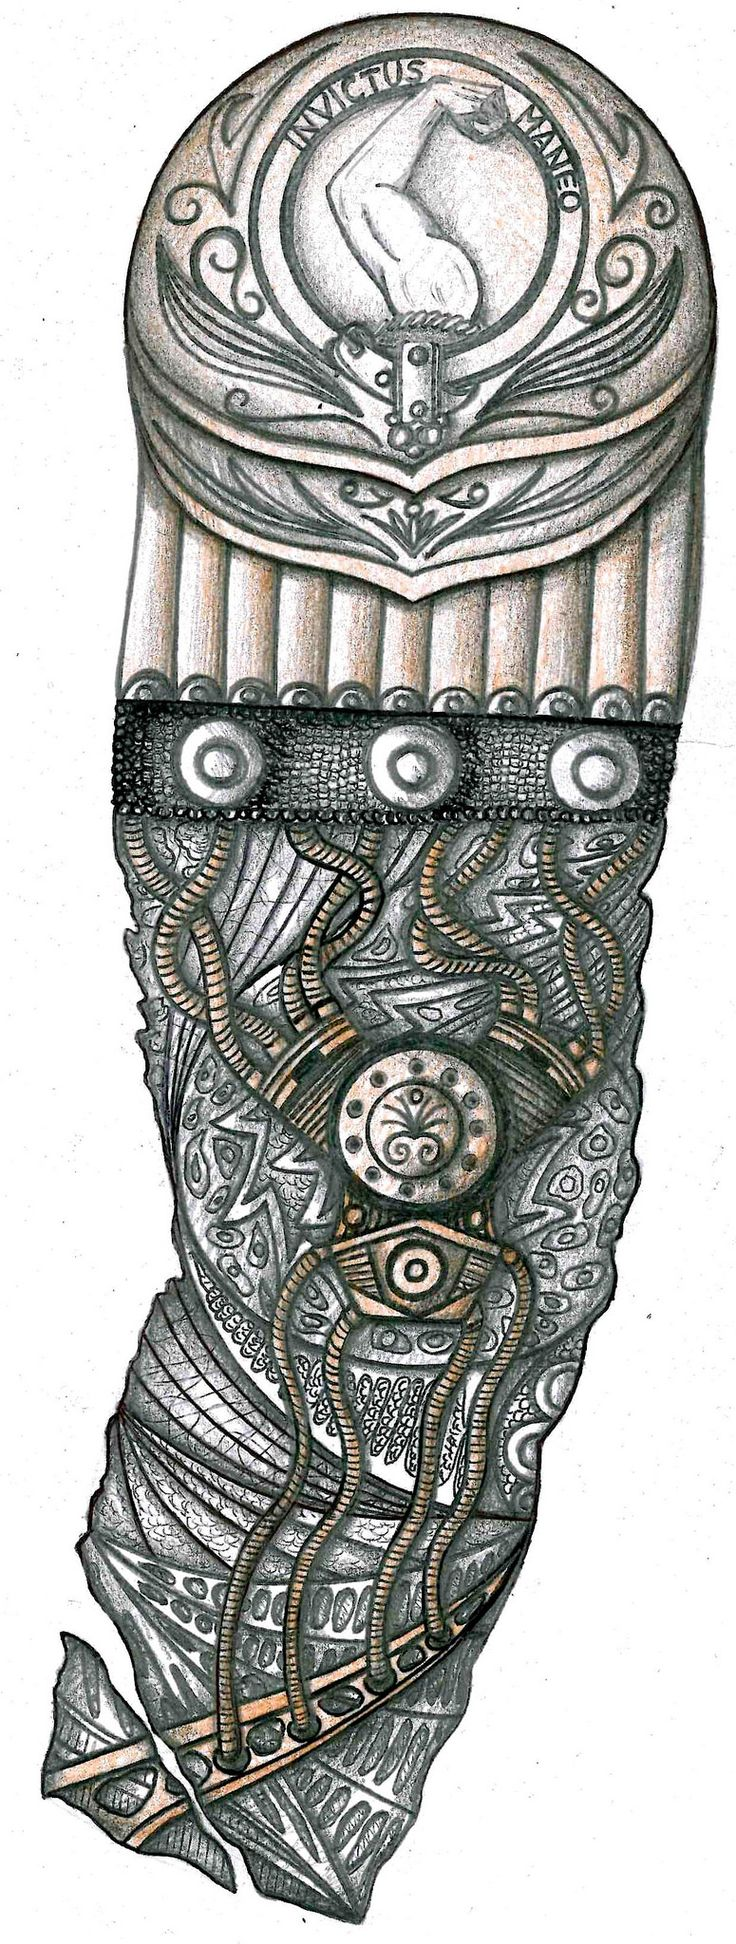 https://flic.kr/p/Cai1GR | Black and Grey Tattoo | black and grey tattoo, zwart grijs tattoos, Zwart en grijs tatoeages | www.popo-shoes.nl